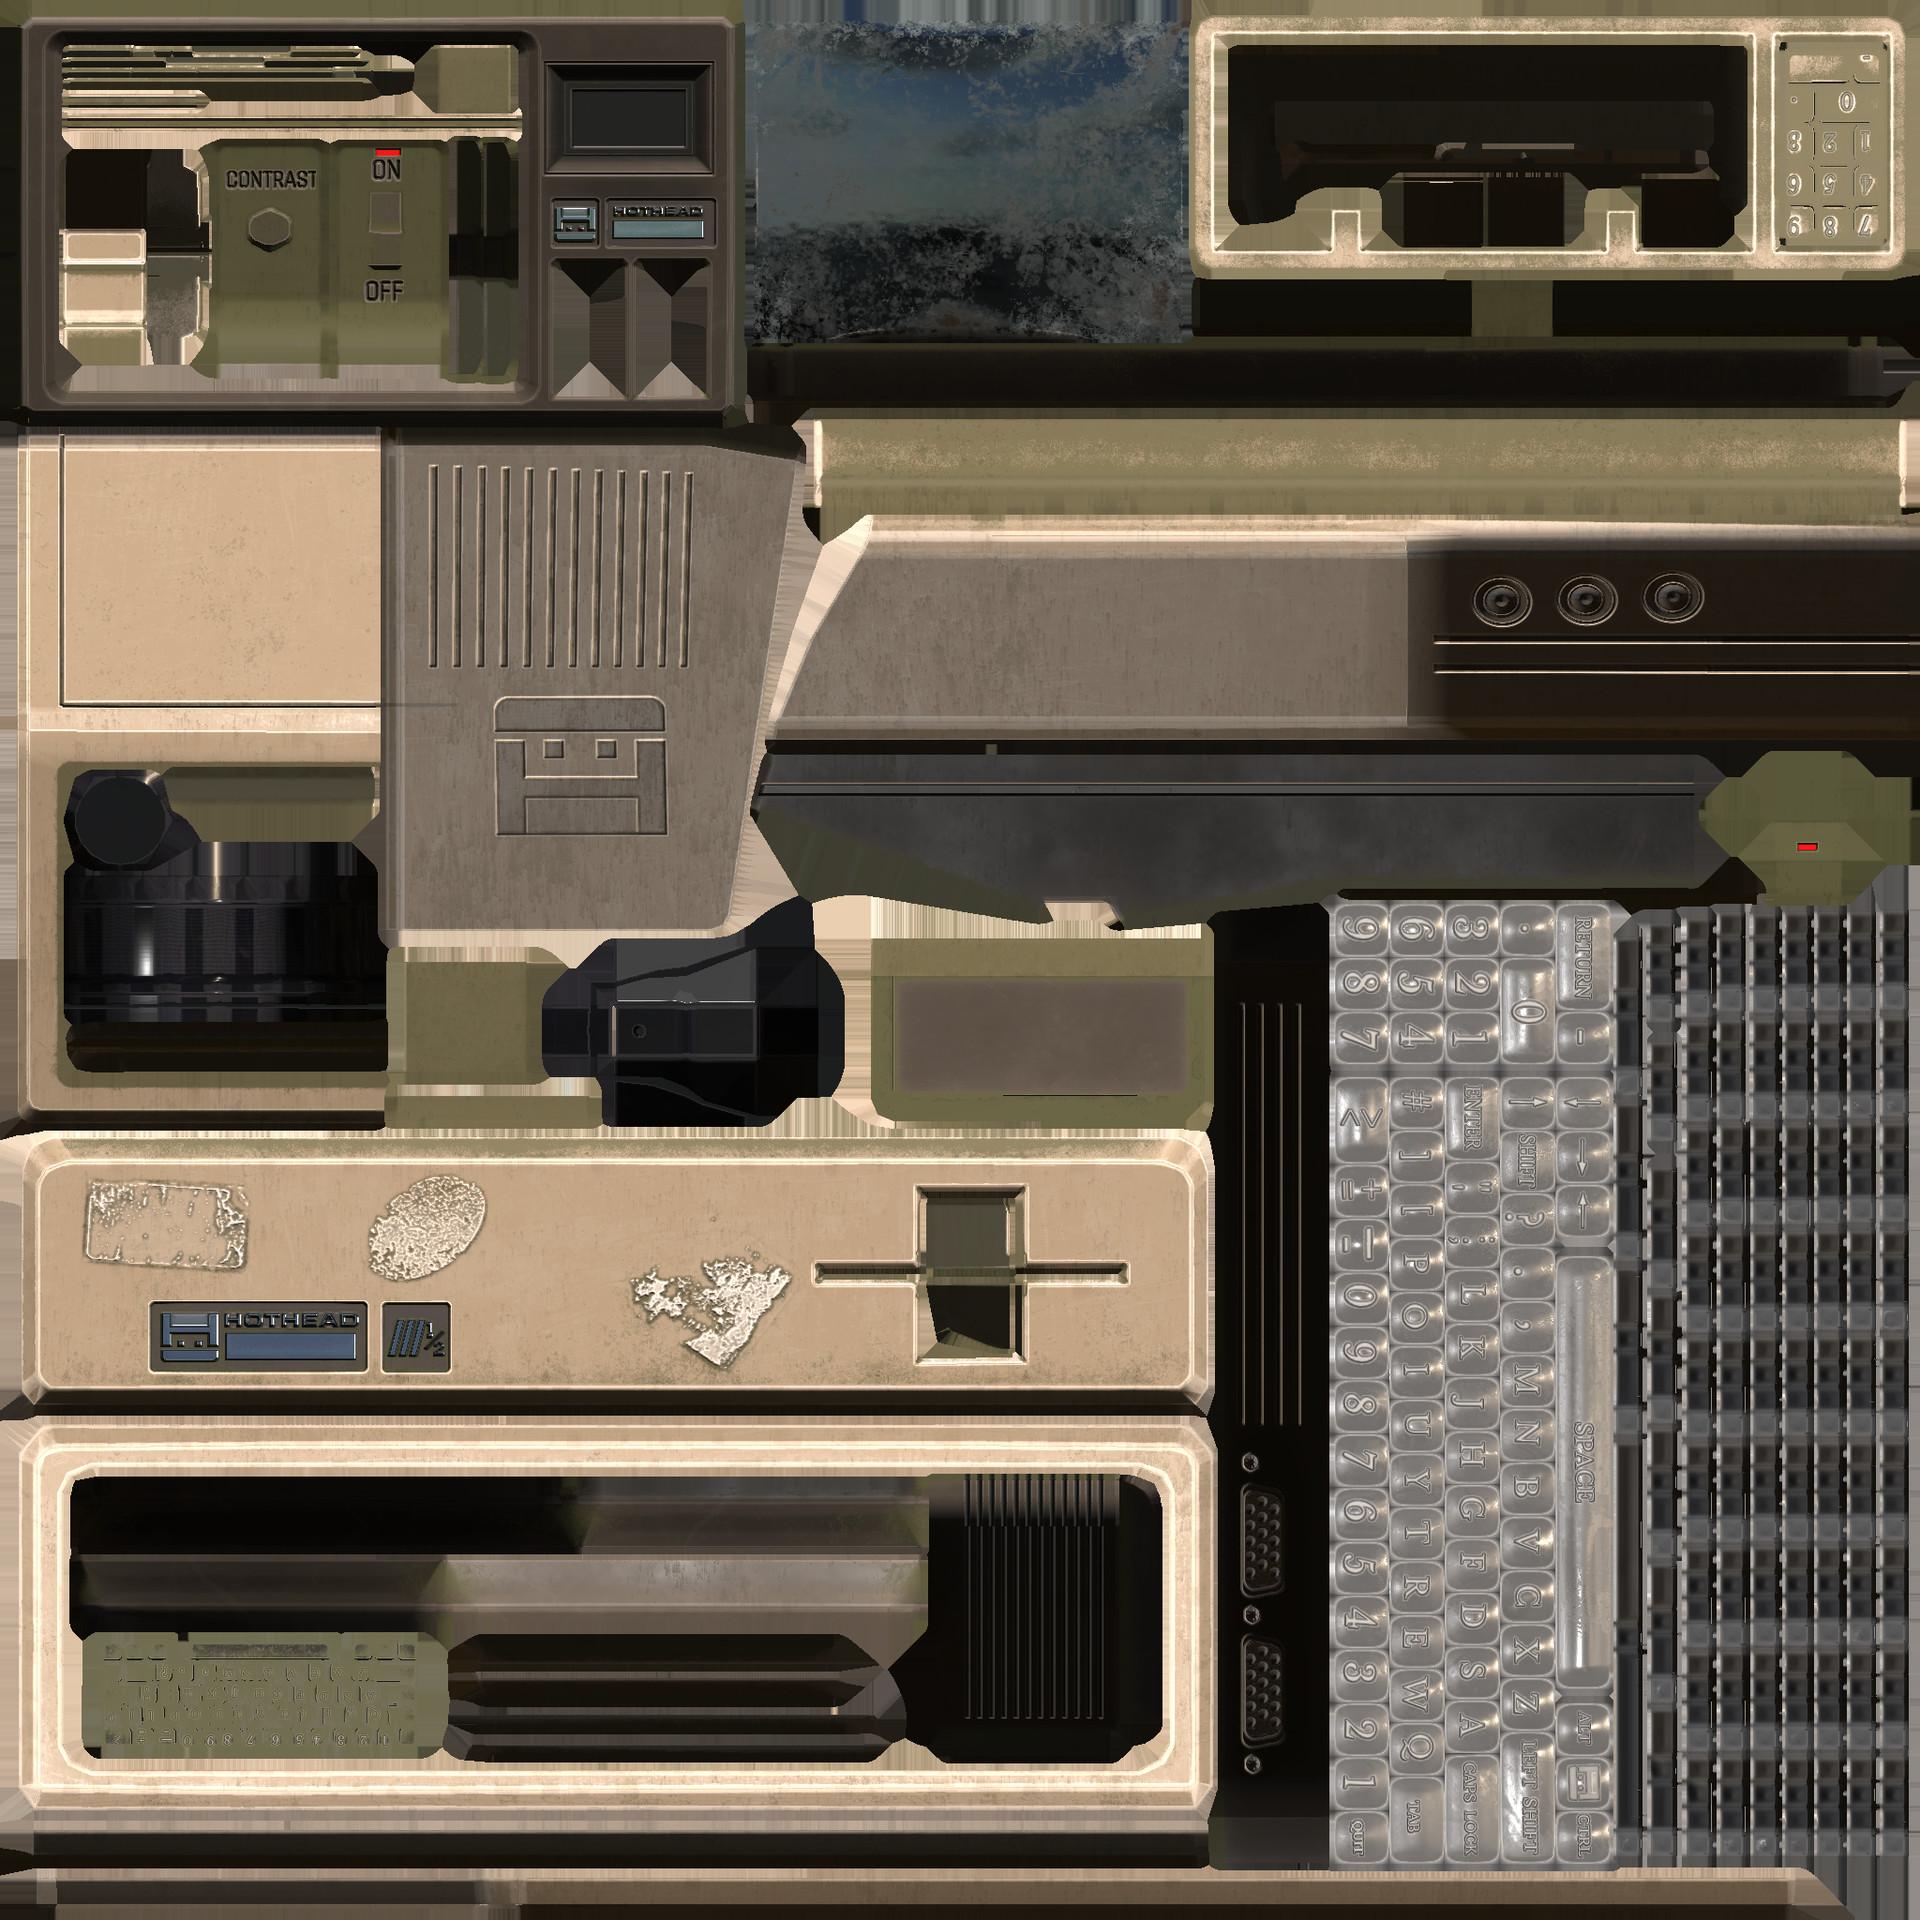 dimitri rosner old computer prop